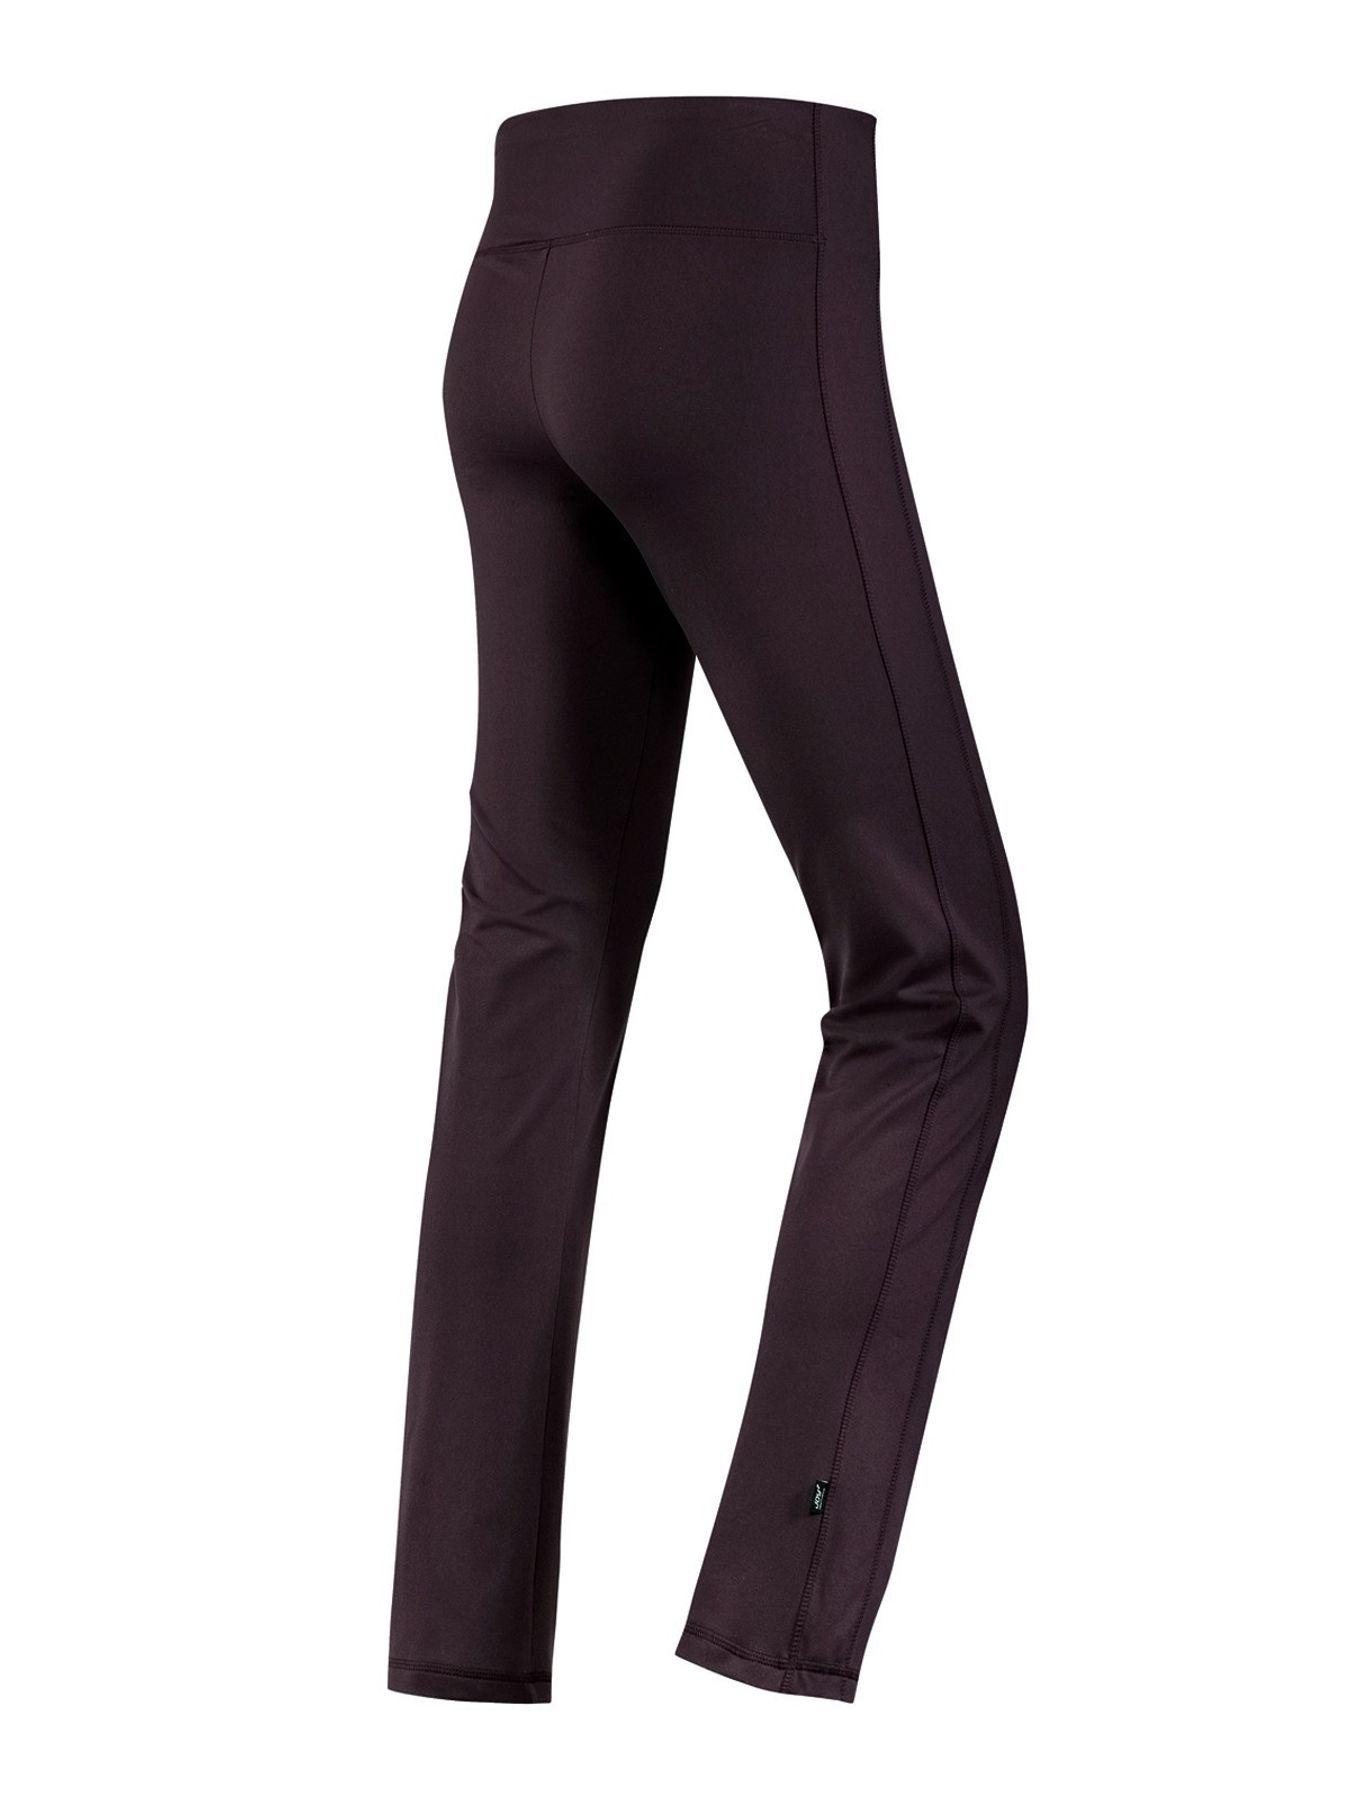 Joy - Bodyfit - Damen Sport Hose in verschiedenen Farben, Ester (30140) – Bild 13